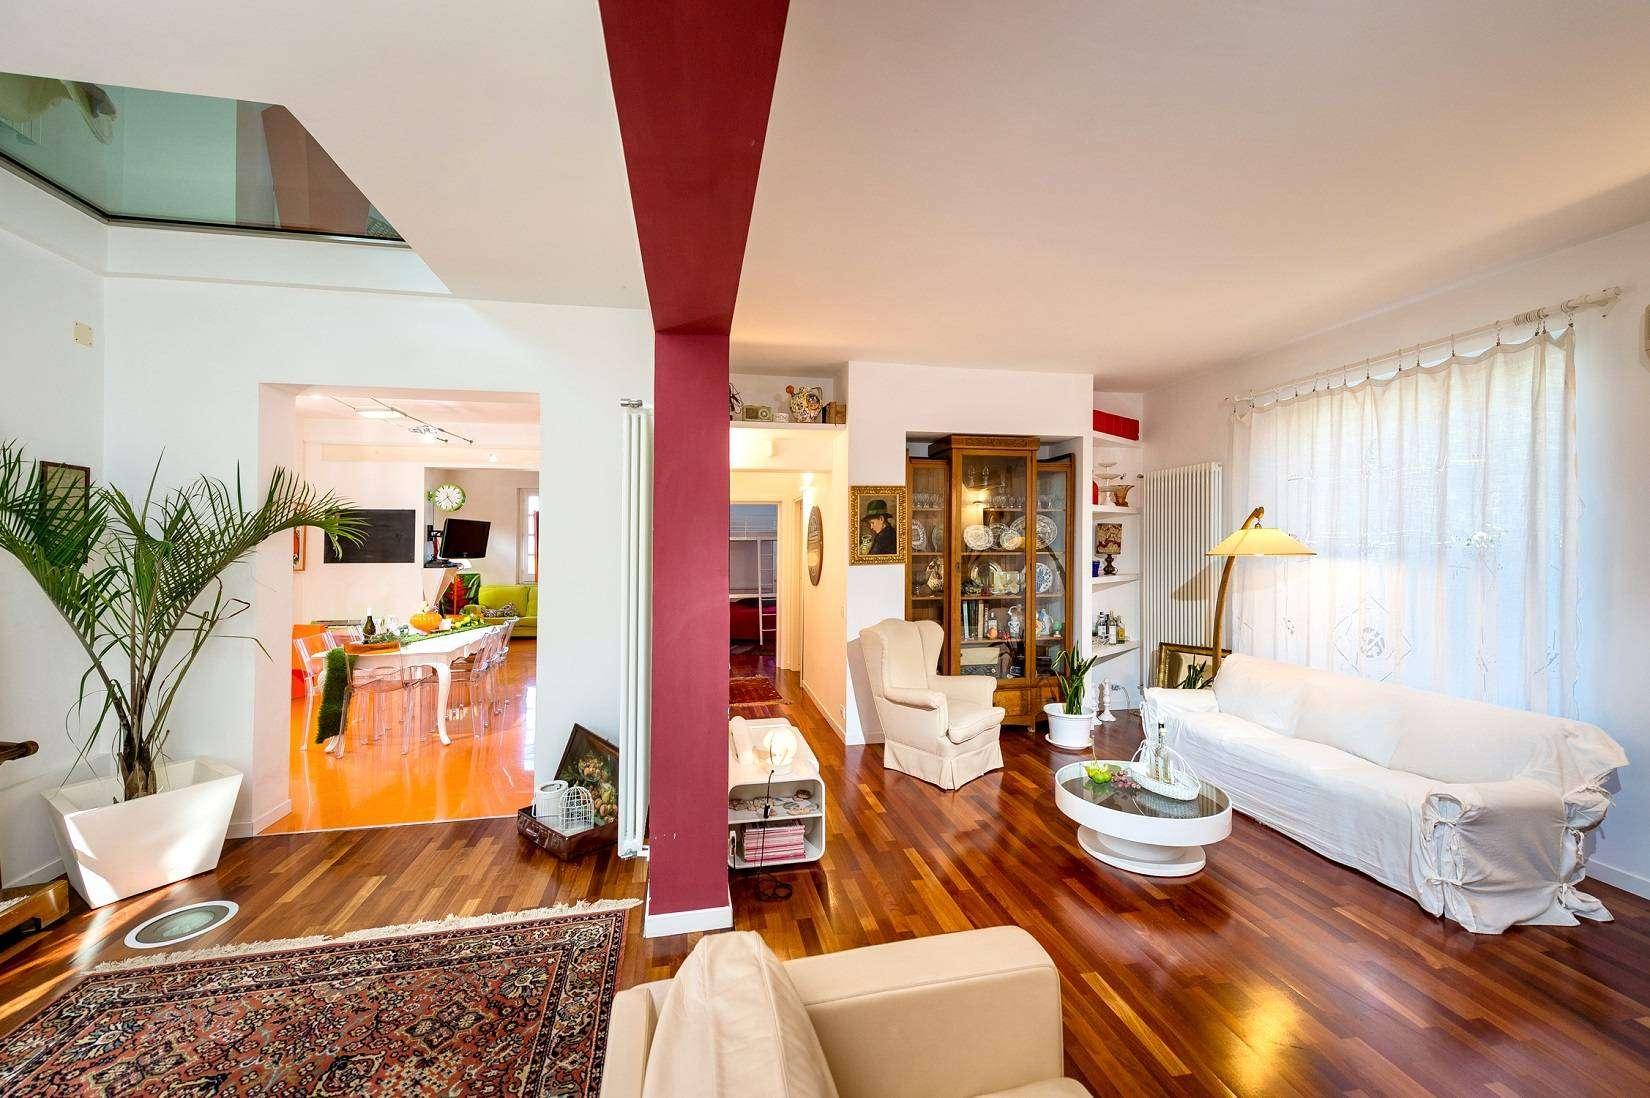 8 Dei Mori living room